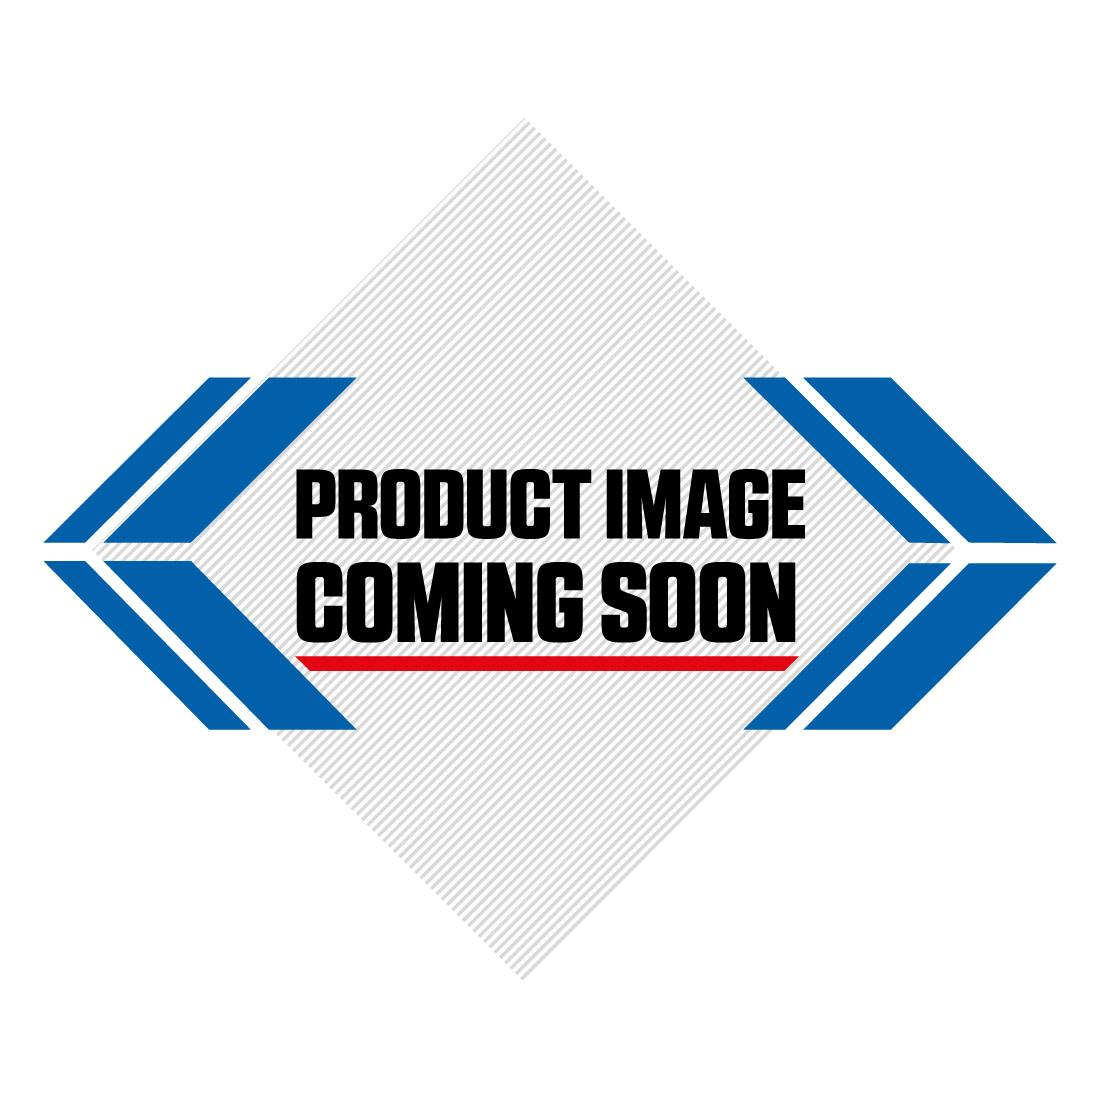 Sidi Crossfire 3 SRS Motocross Boots - TC222 Cairoli LTD Edition Image-4>